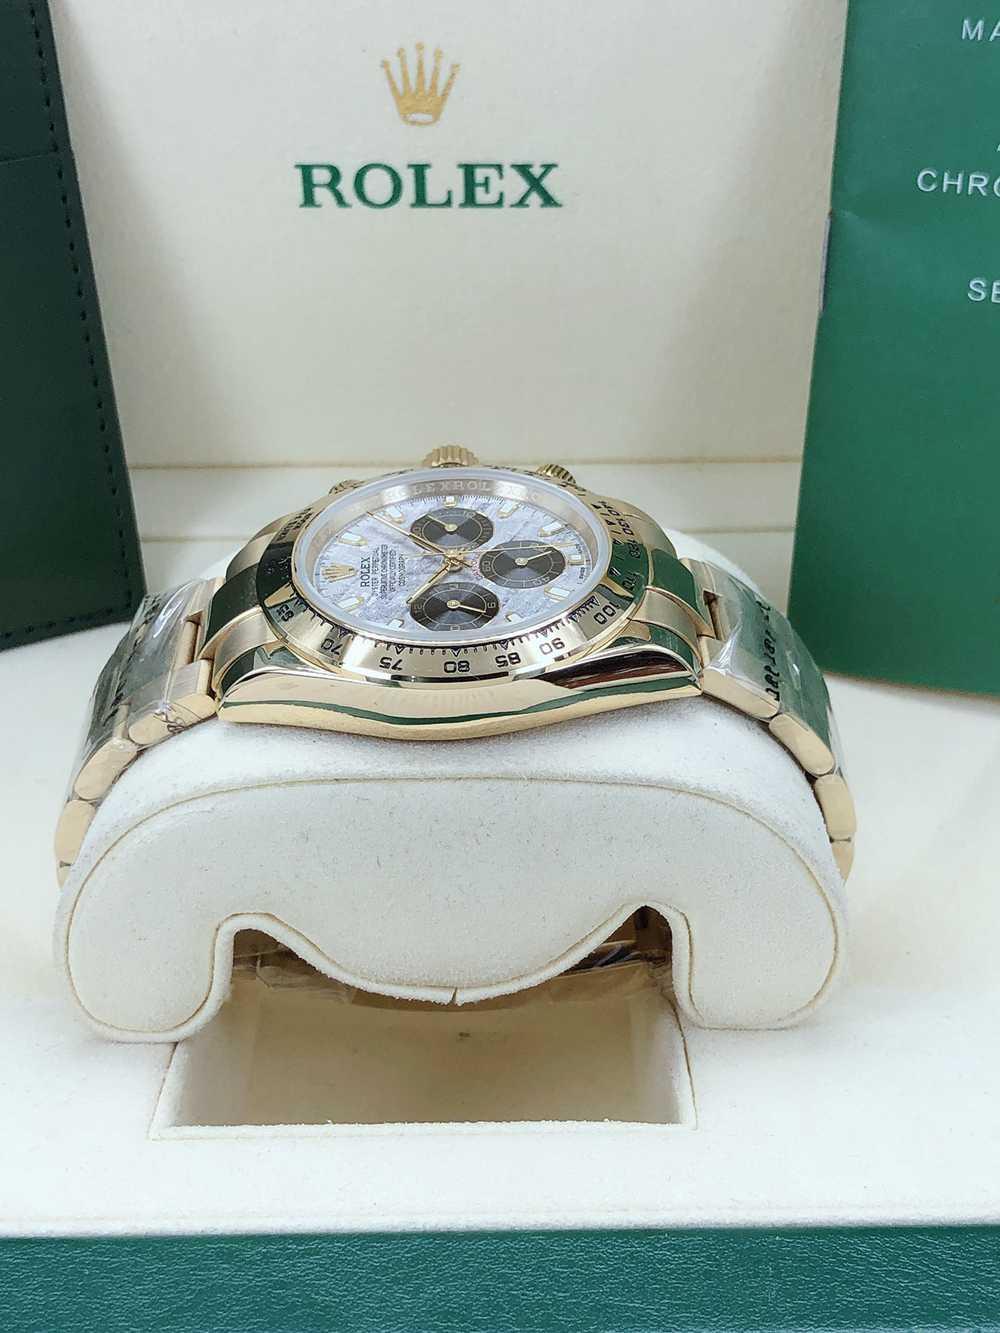 Daytona Meteorite face gold case 40mm AAA automatic 2813 movement men's luxury steel watch S